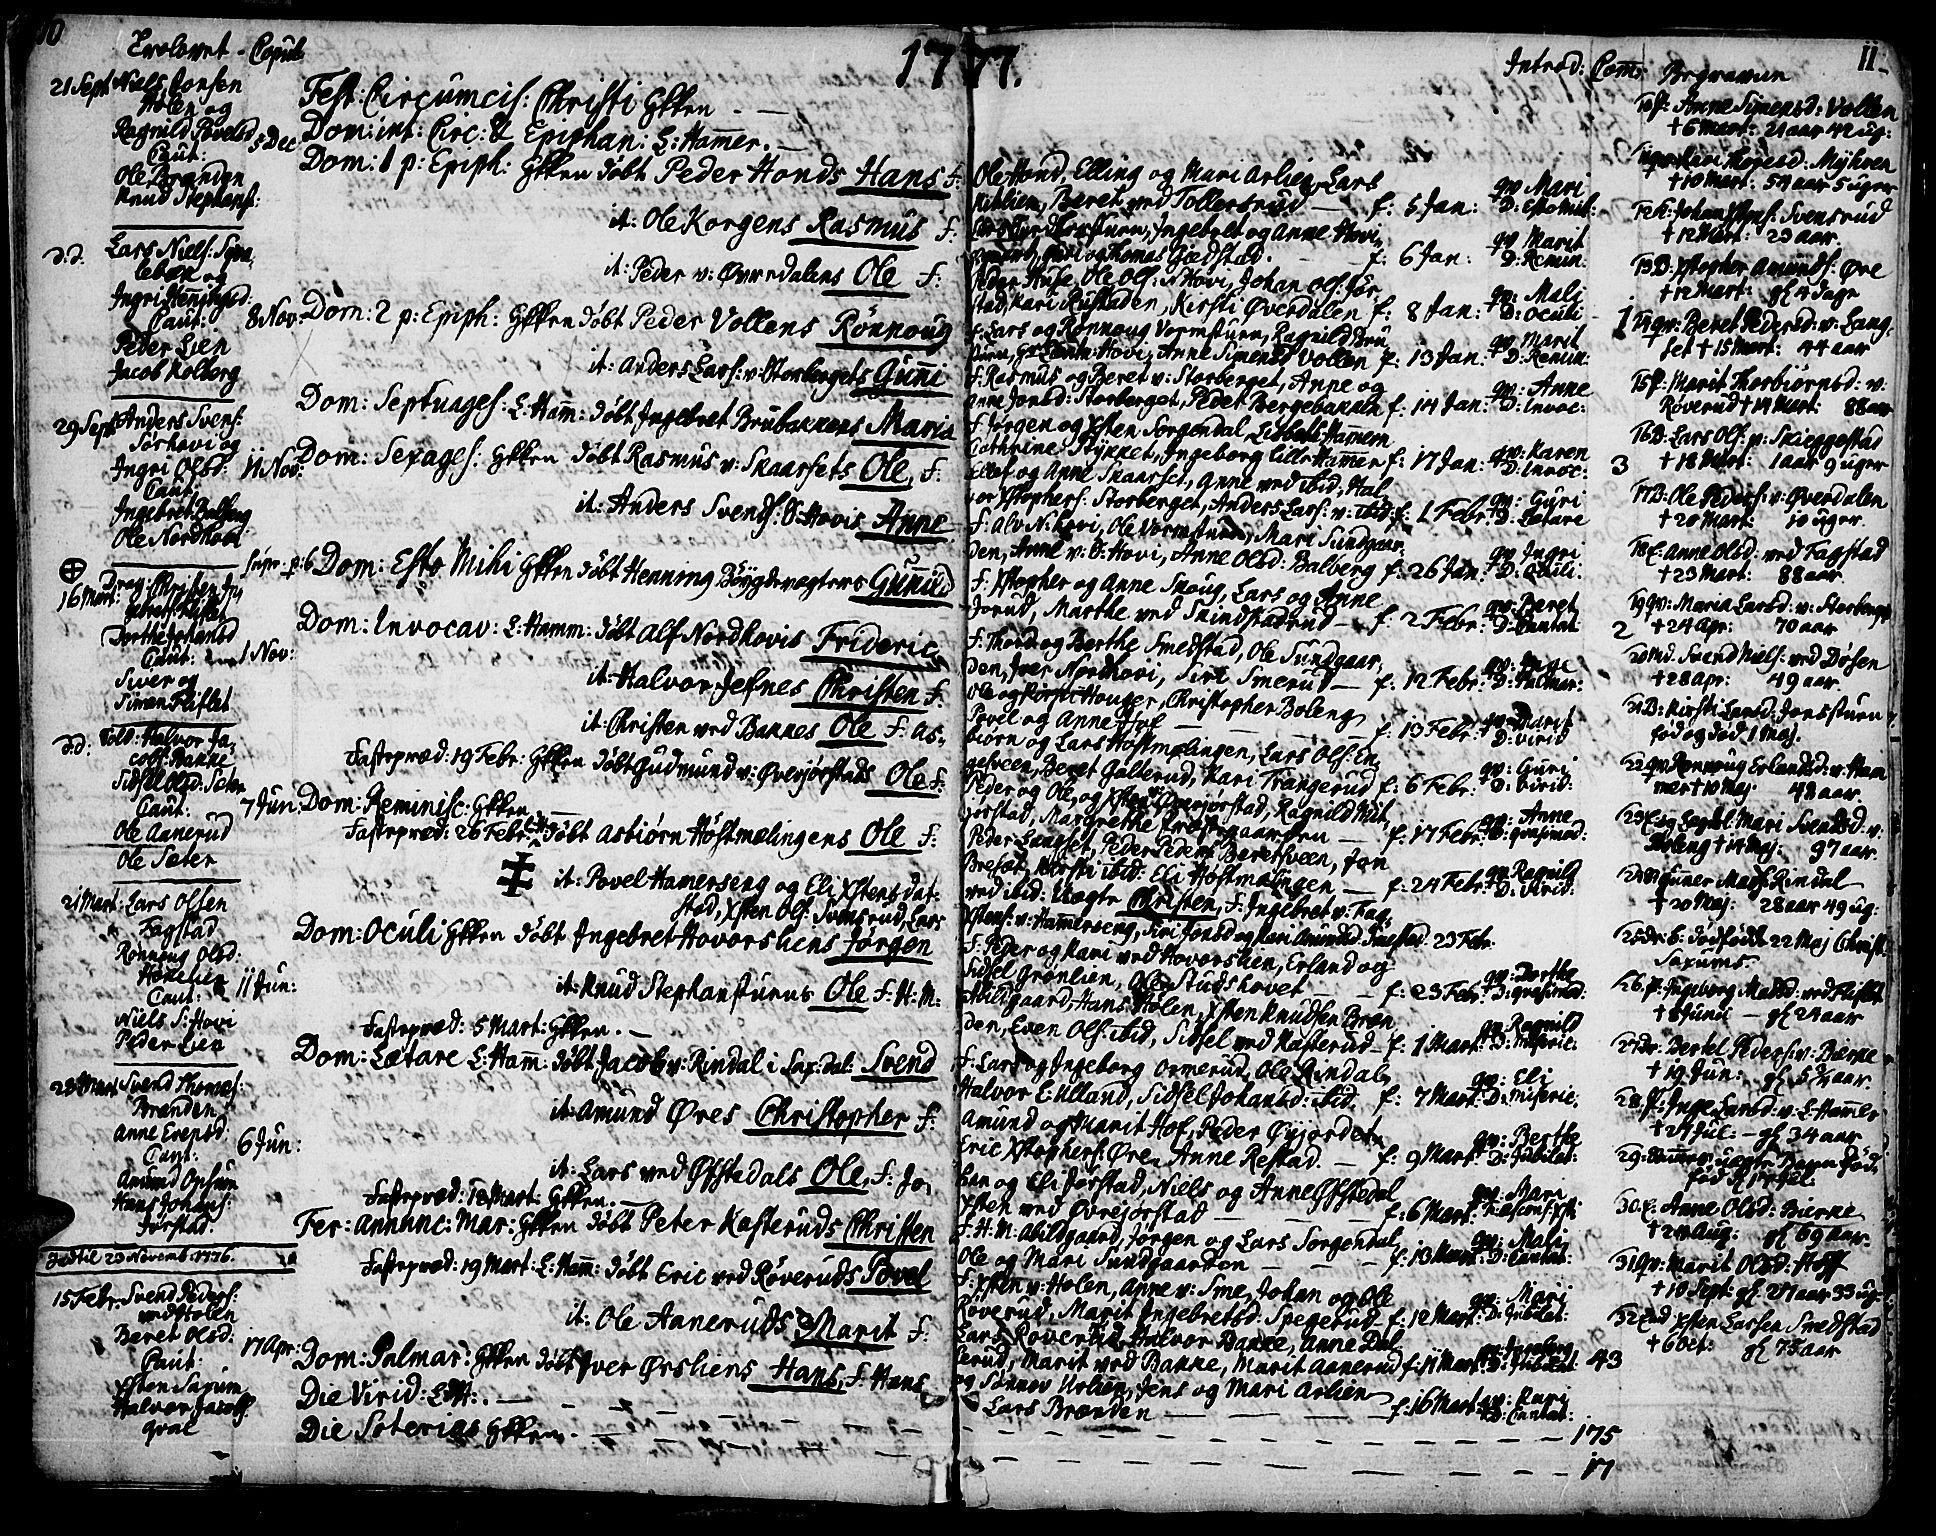 SAH, Fåberg prestekontor, Ministerialbok nr. 2, 1775-1818, s. 10-11